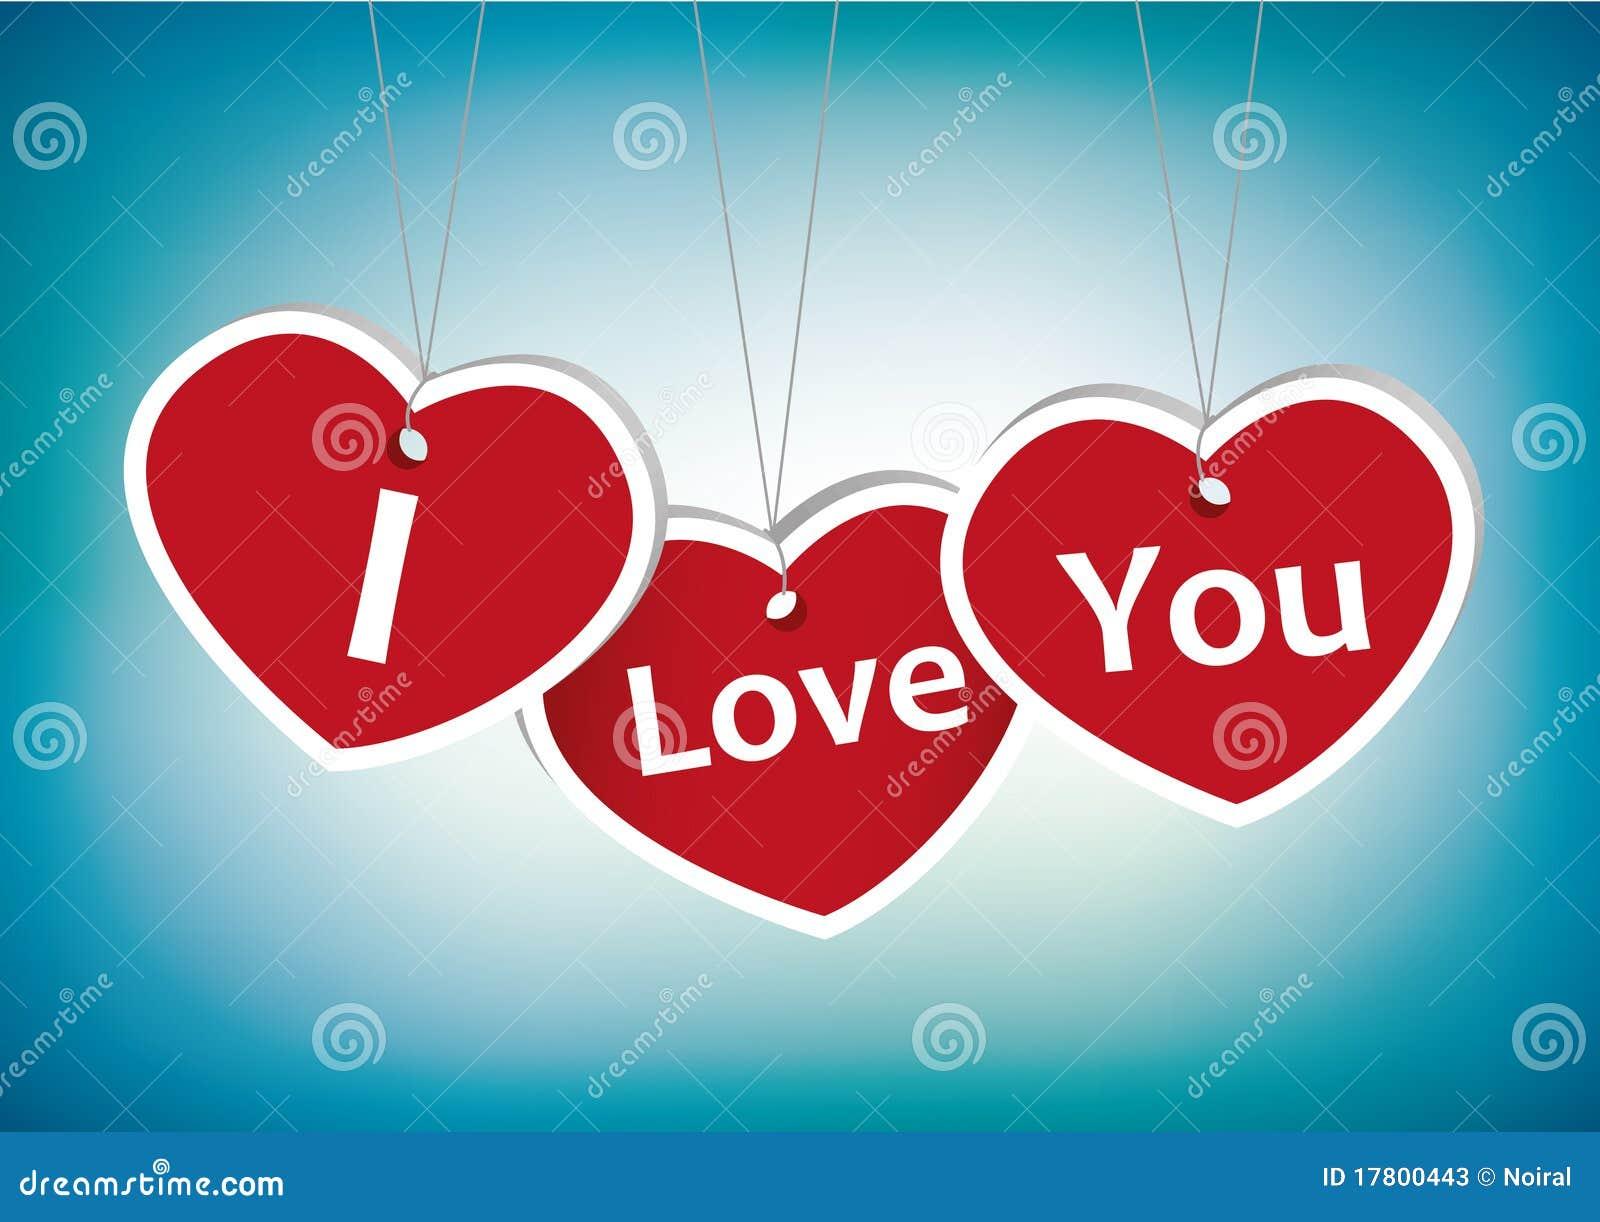 i love you greeting card stock photos  image 17800443